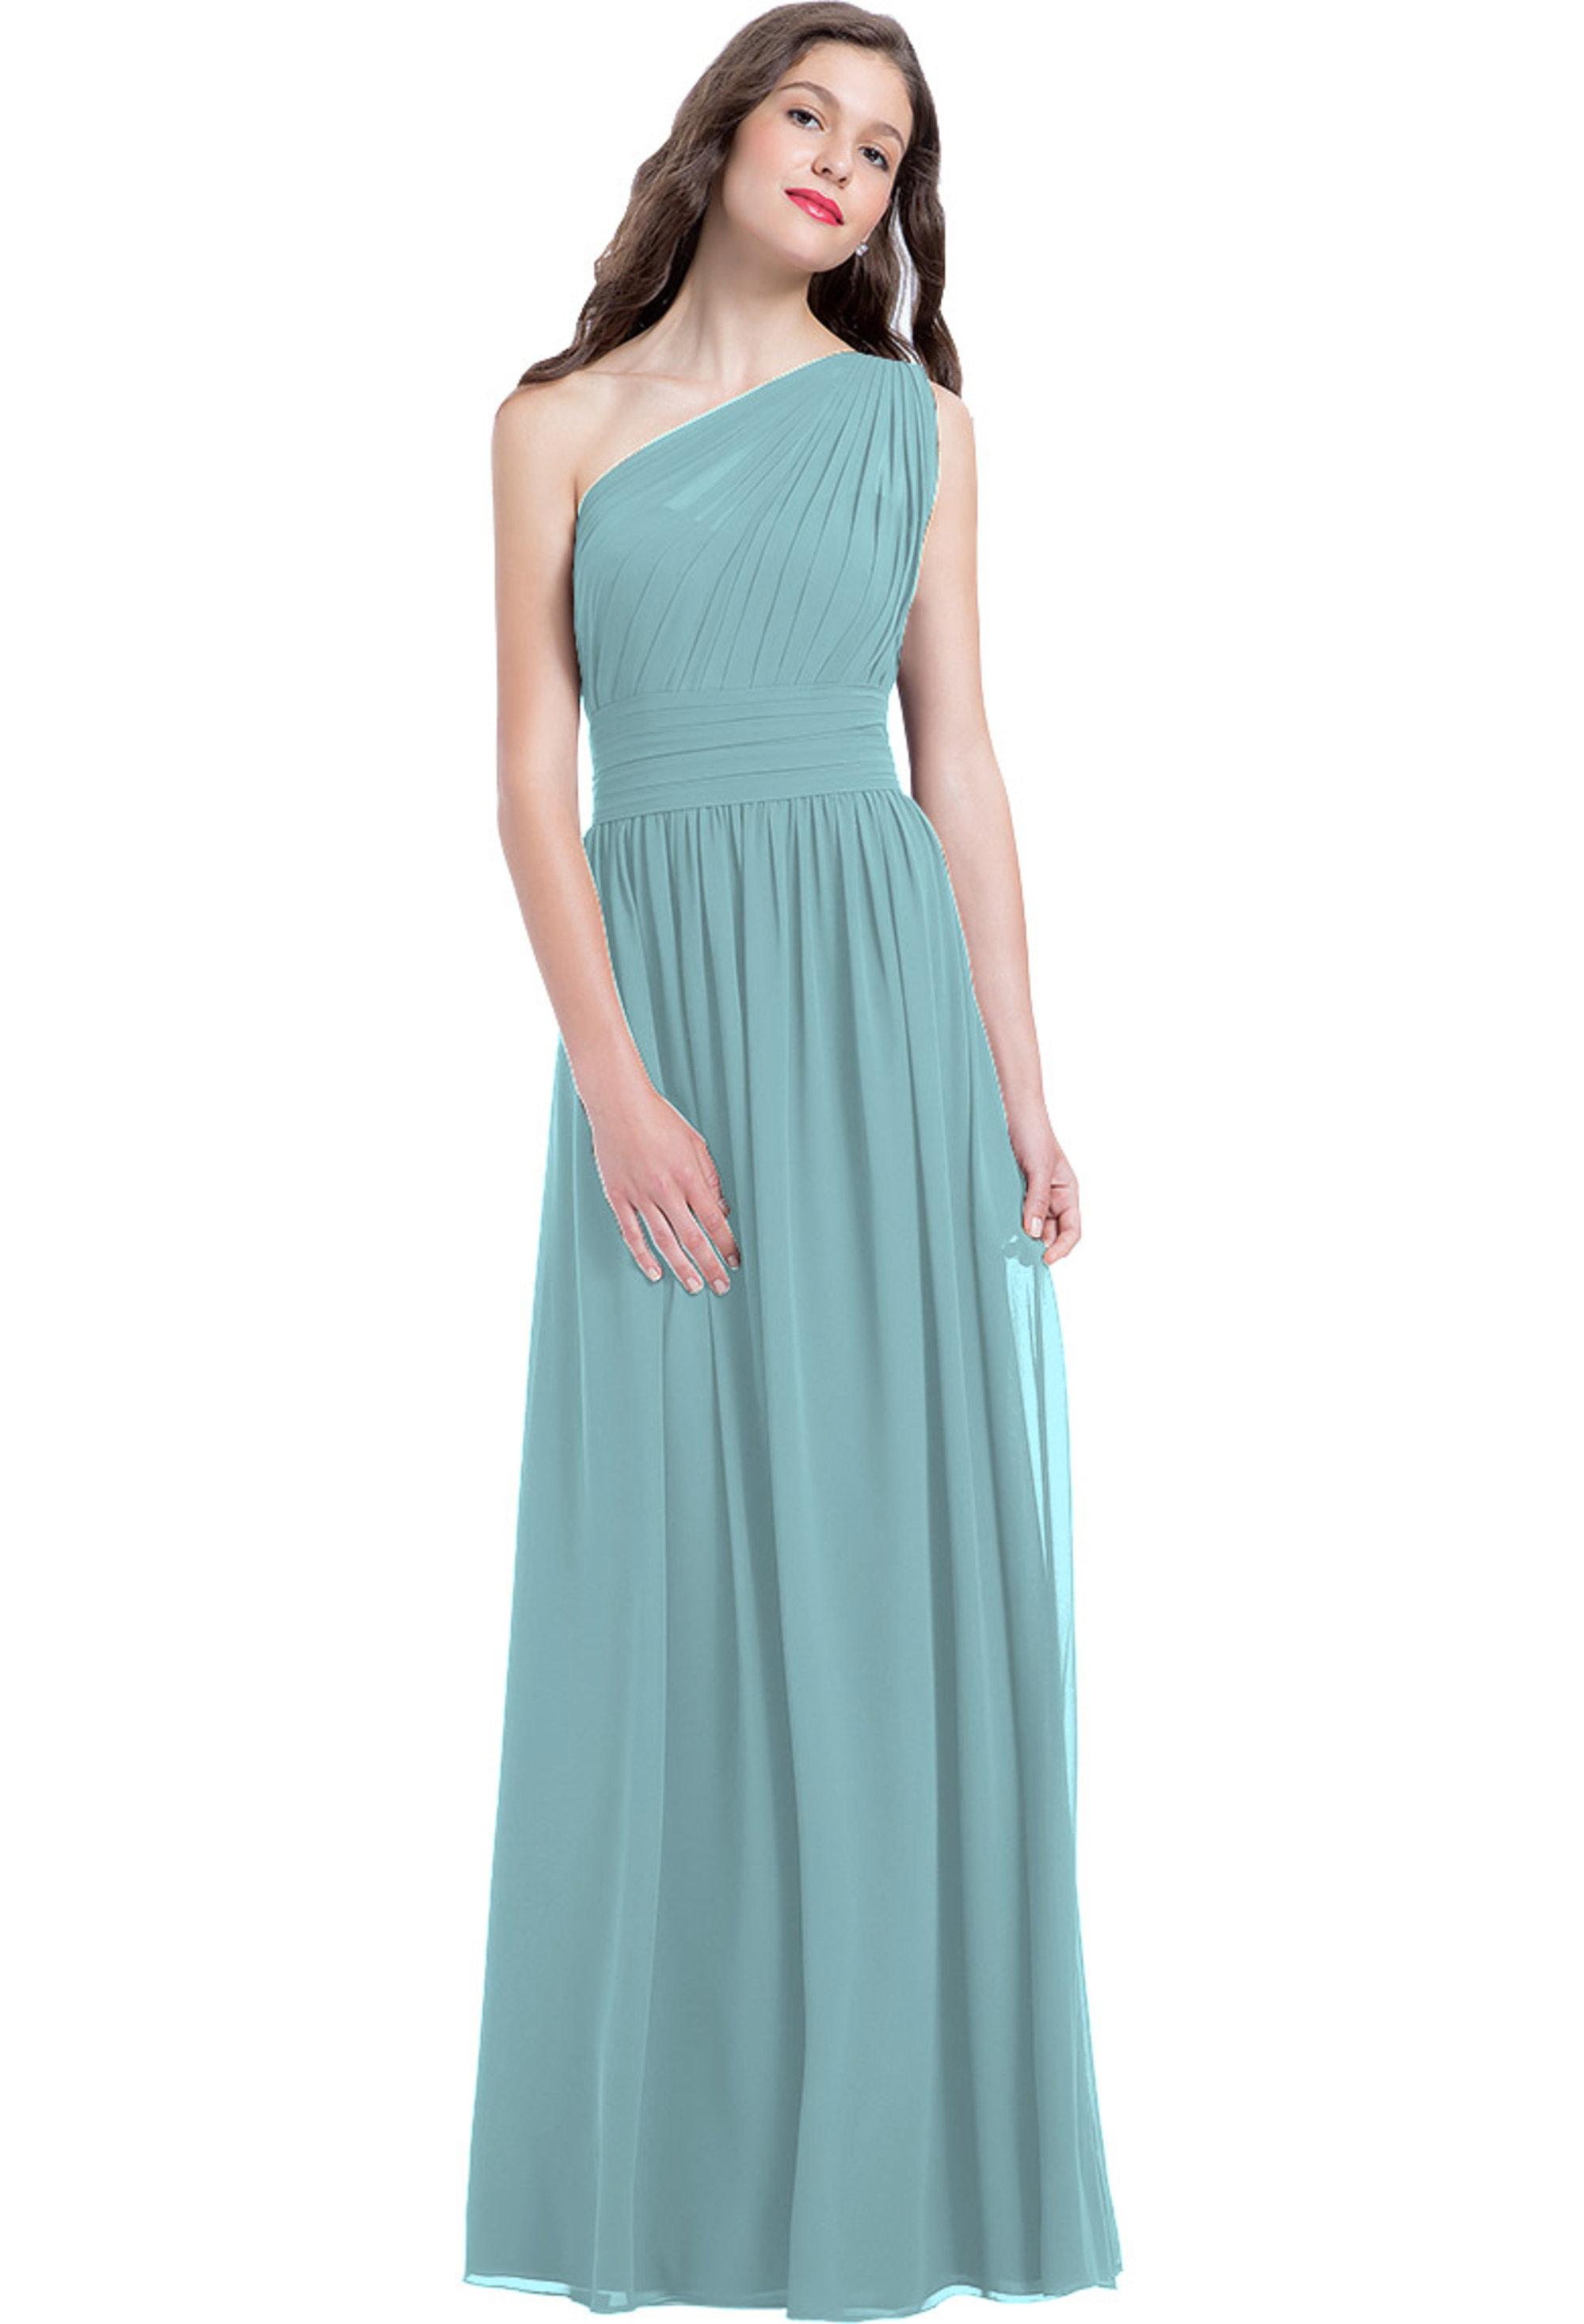 Bill Levkoff GLACIER Chiffon One Shoulder A-line gown, $224.00 Front